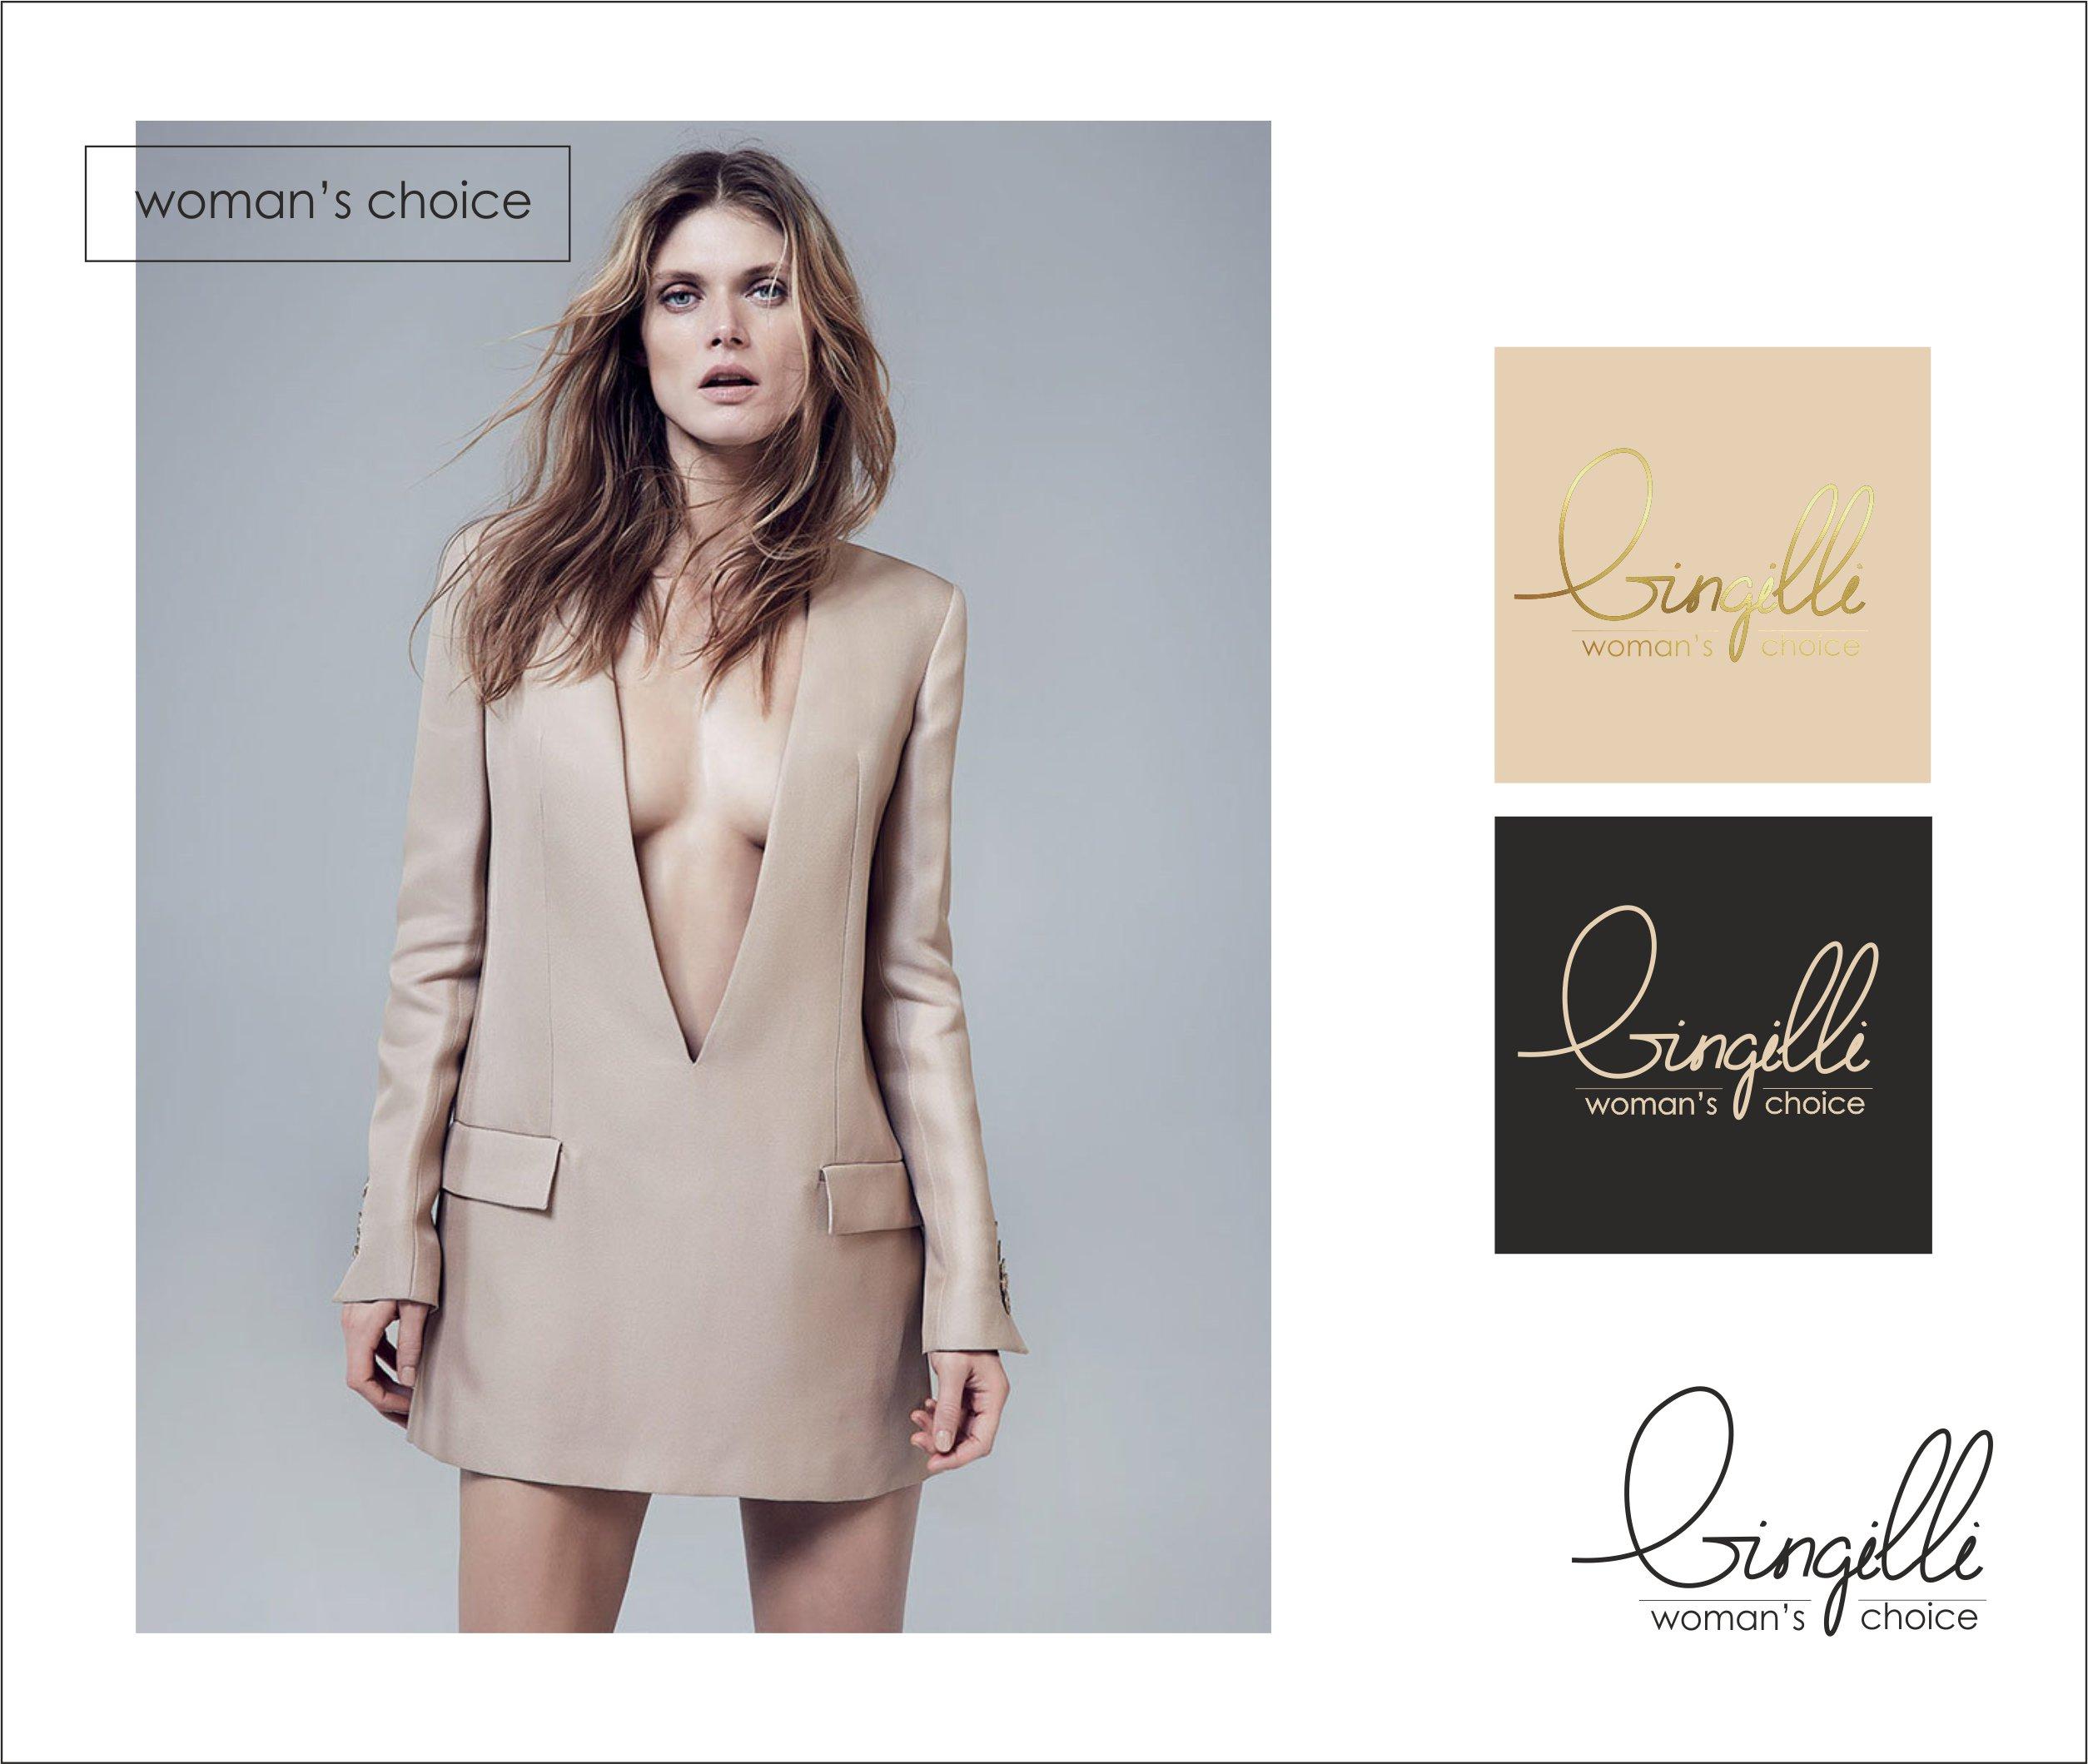 FASHION BRAND/ Разработка фирменного стиля для женской одежд фото f_3225a336b0791db4.jpg